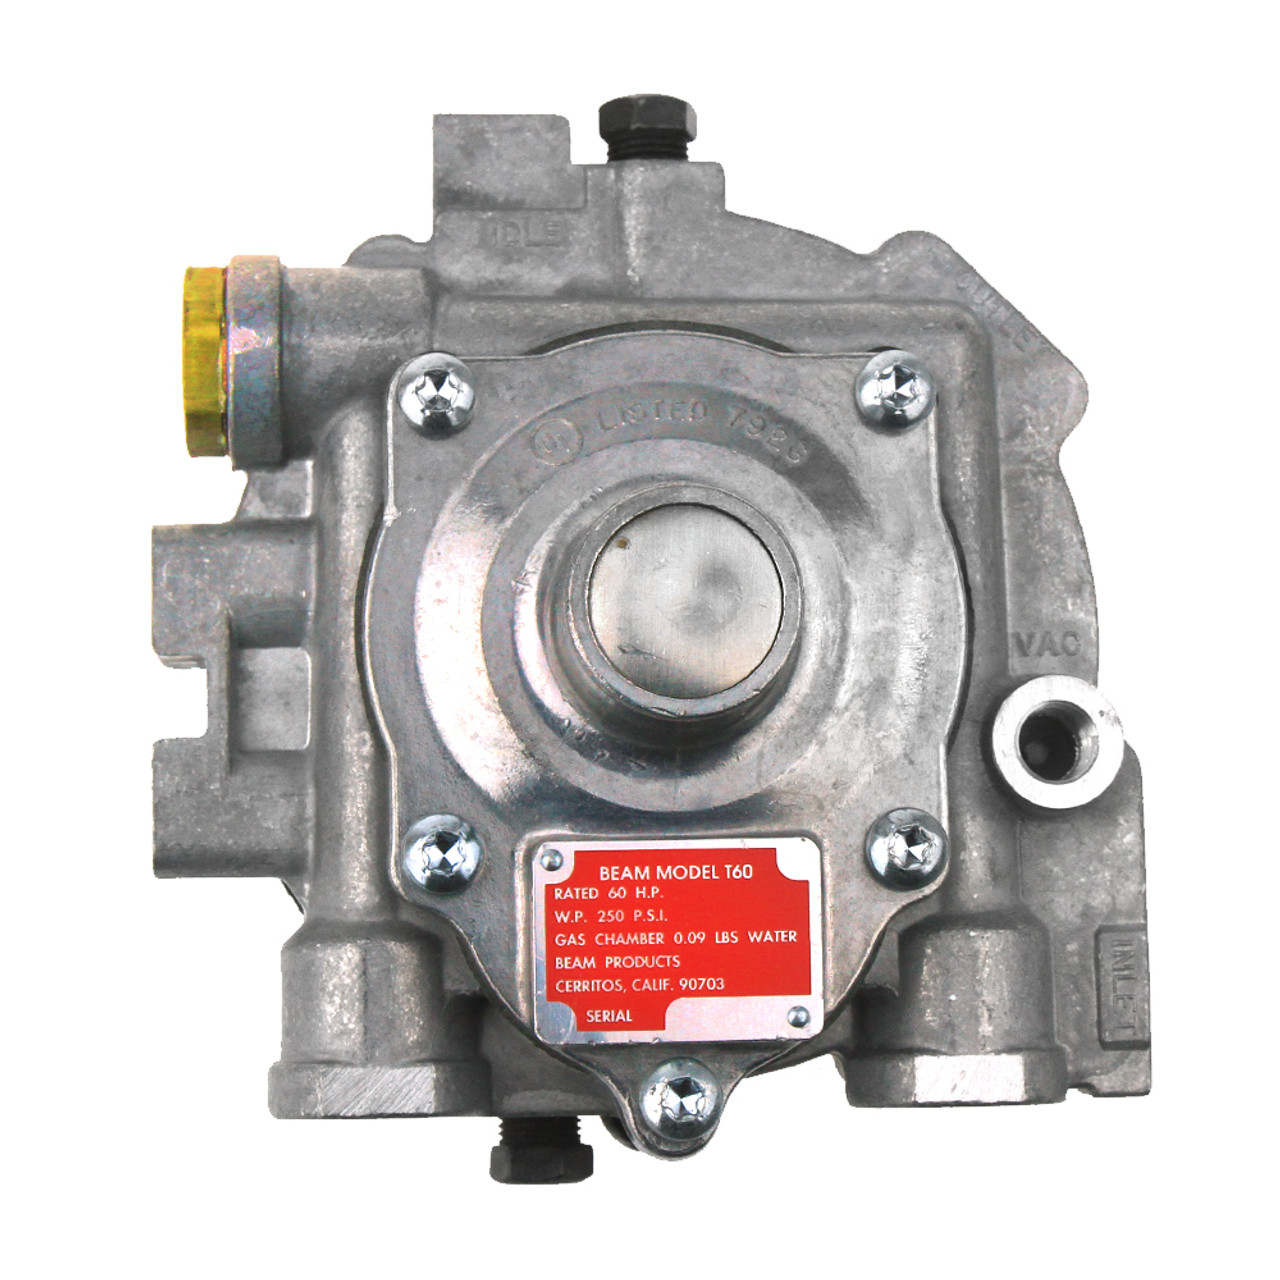 impco beam model t60 60 hp gas chamber propane forklift gas regulator  [ 1000 x 1000 Pixel ]